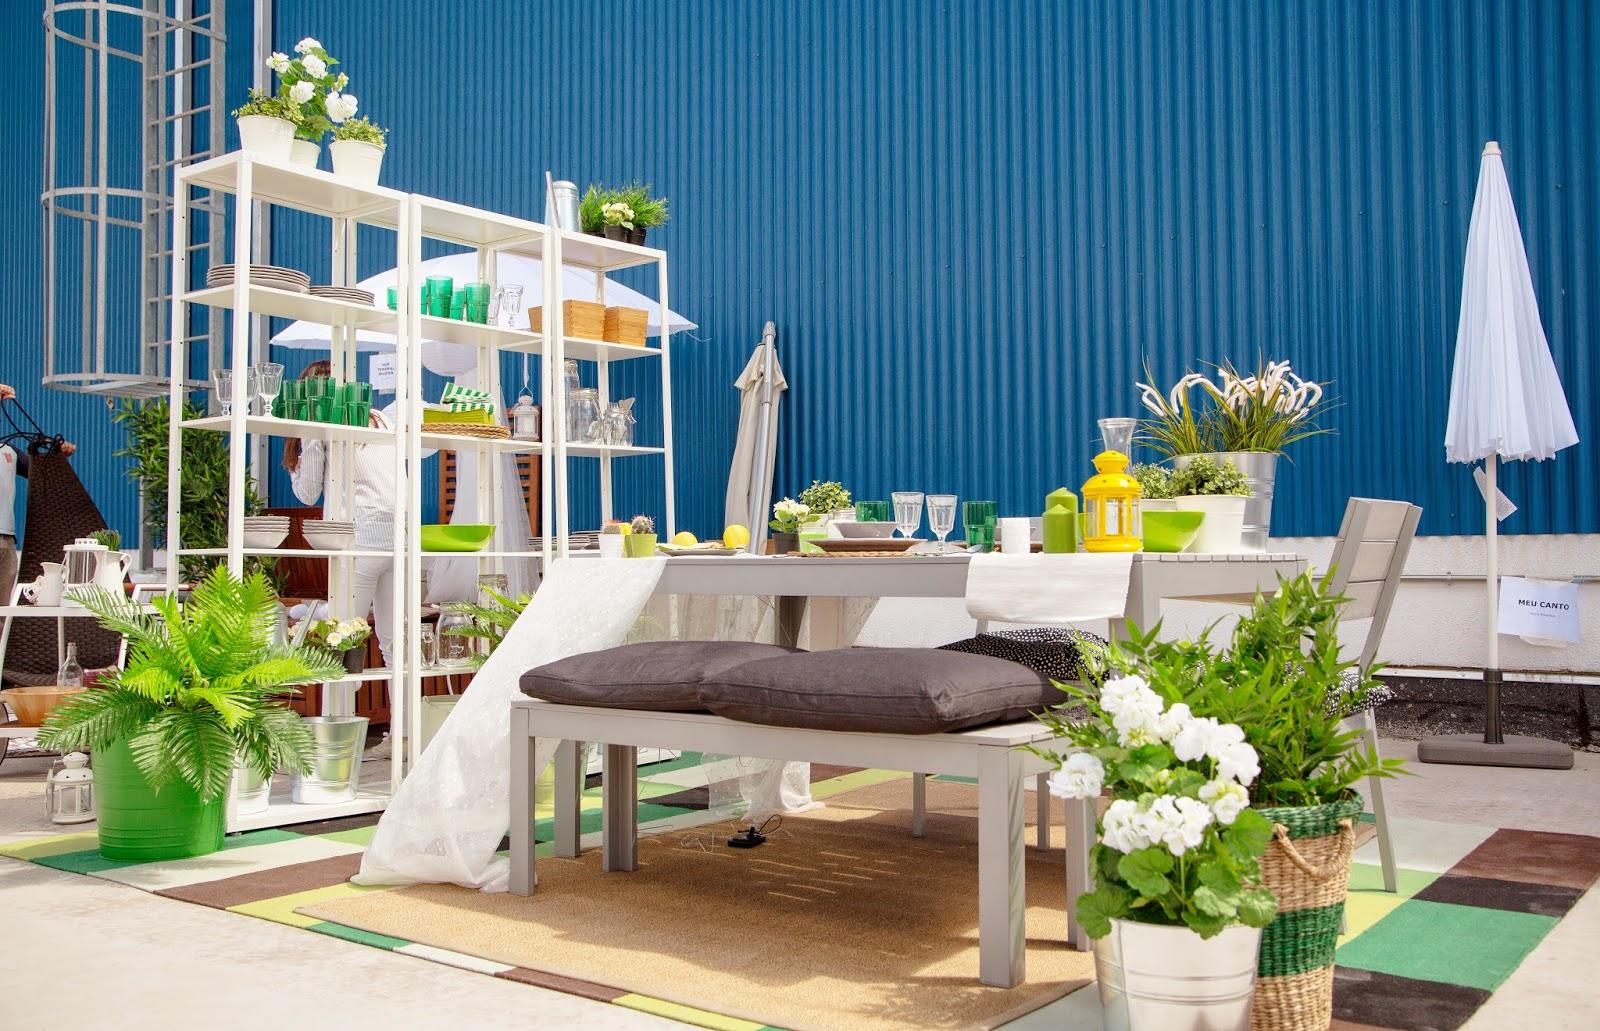 Decora la primavera - Ikea - Meu Canto